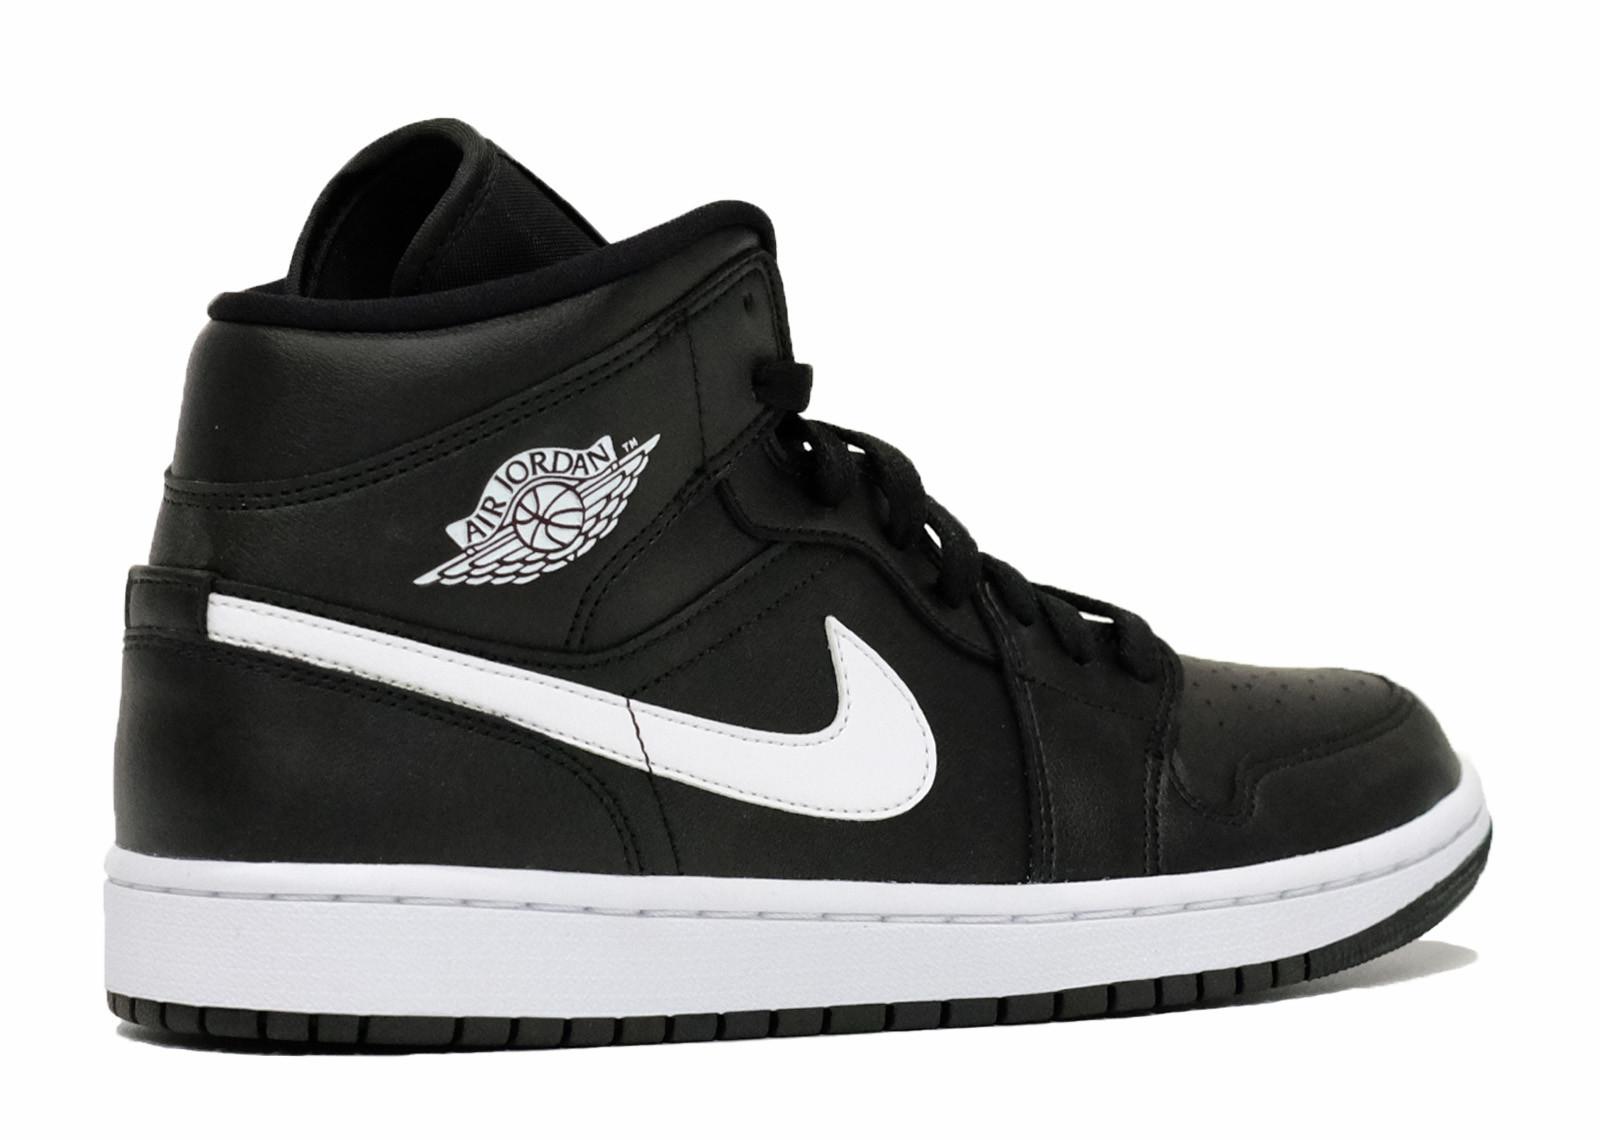 Air Jordan 1 Mid Black White image 2